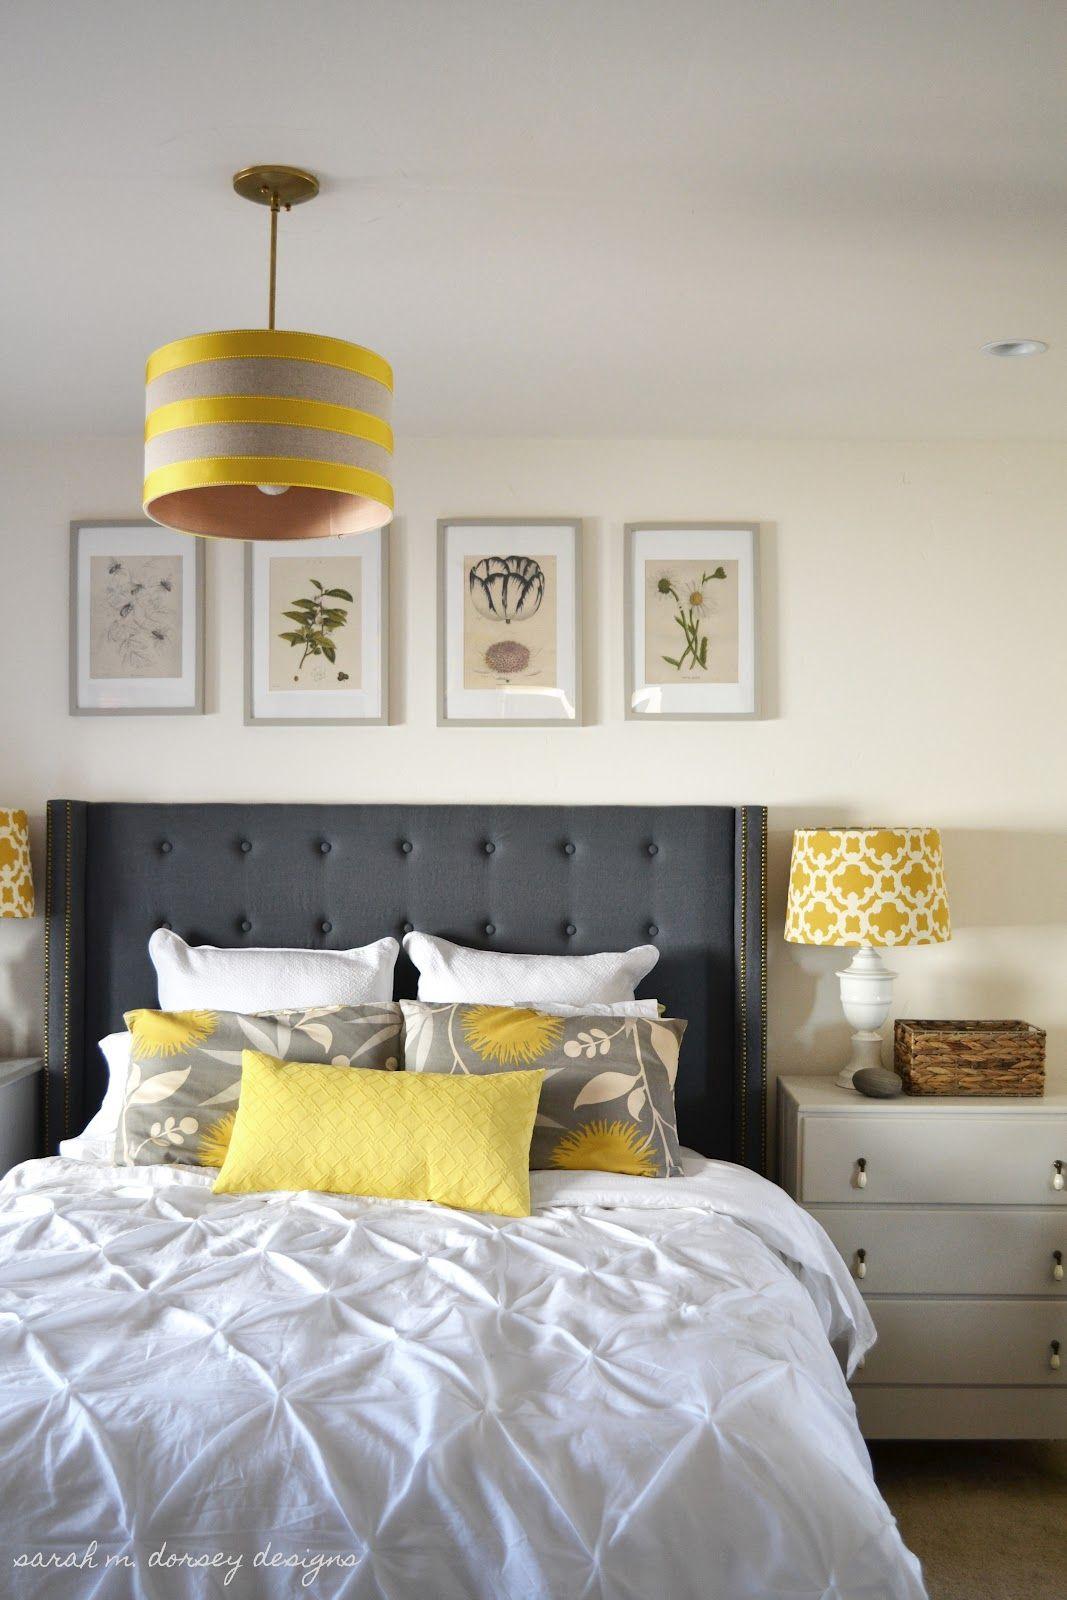 Best Sarah M Dorsey Designs Art For Above The Headboard 400 x 300